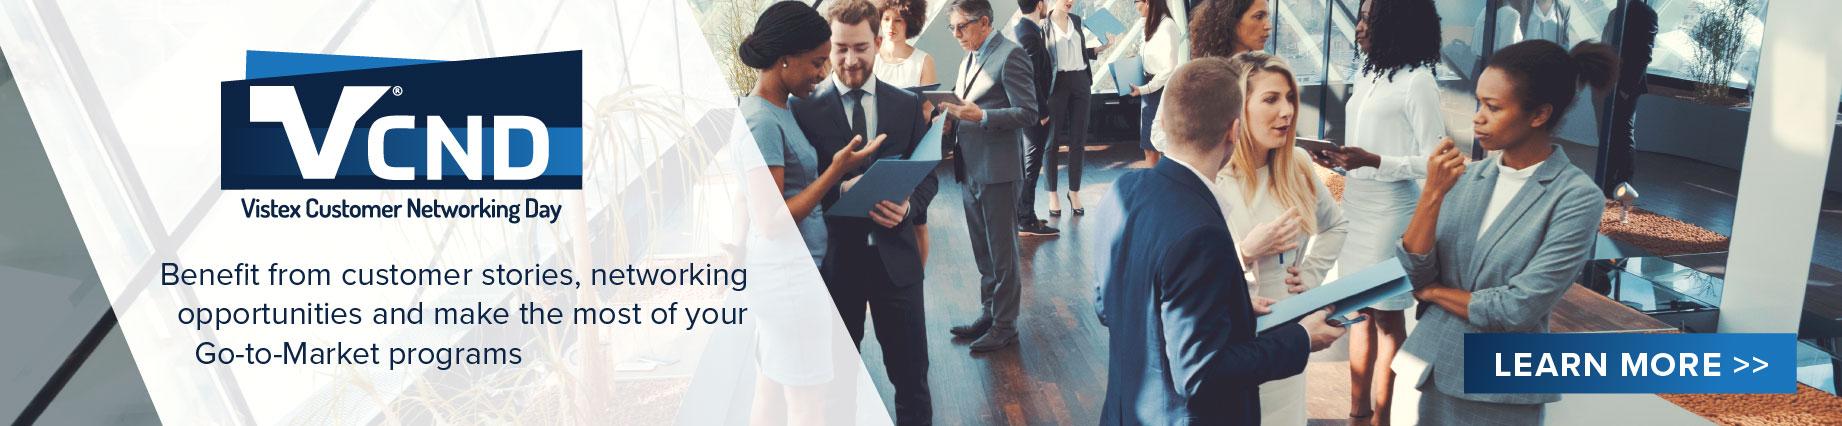 Vistex Customer Networking Day (UK)